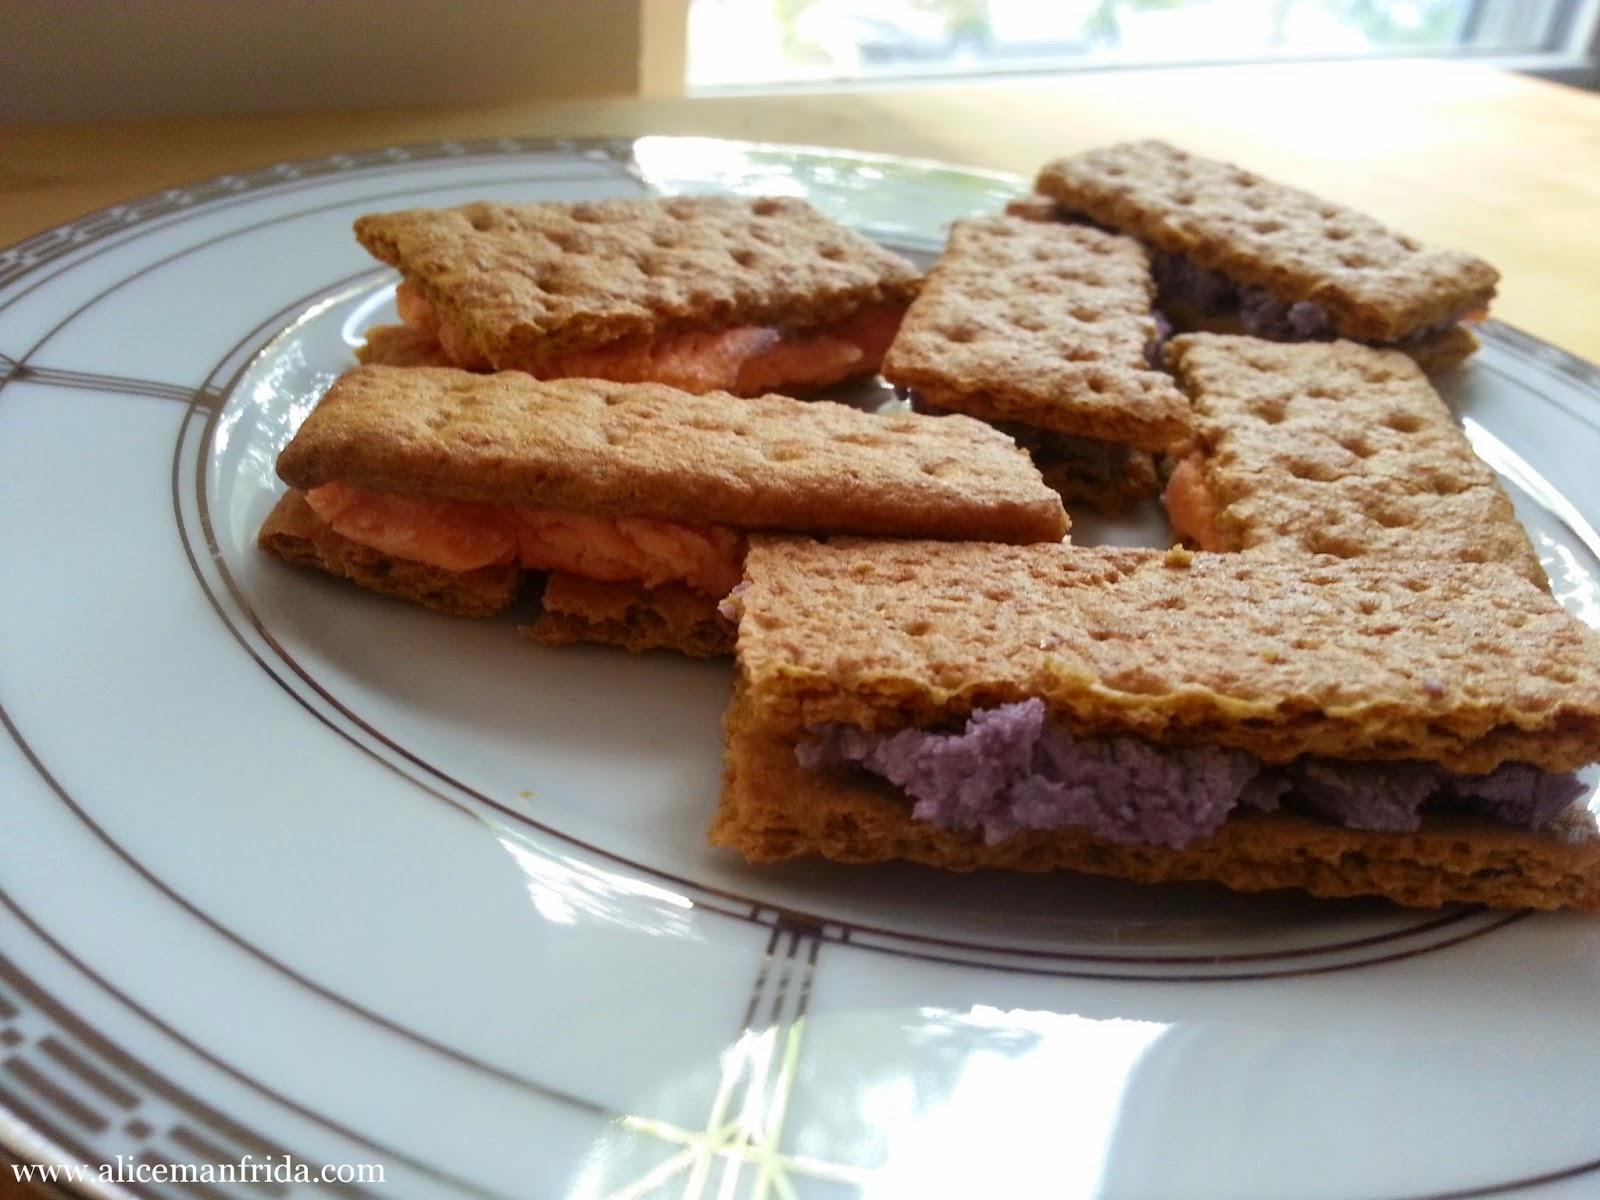 snack, graham crackers, frosting, www.alicemanfrida.com